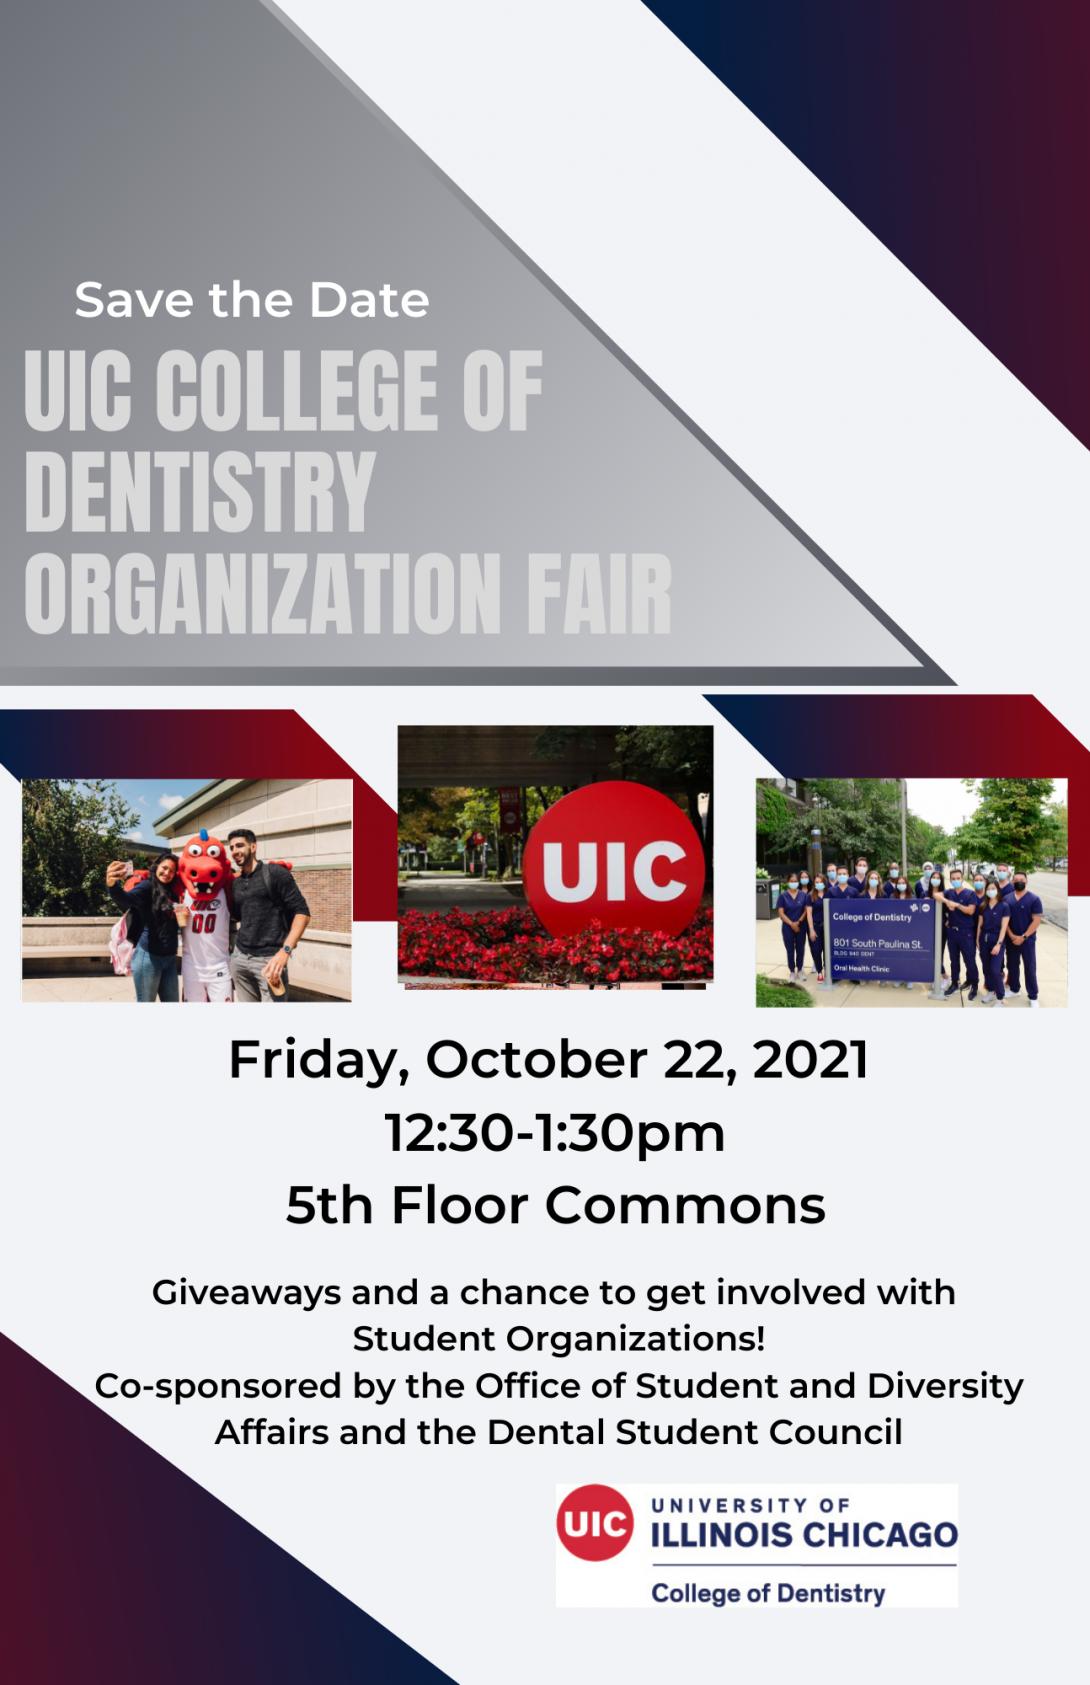 UIC College of Dentistry Organization Fair